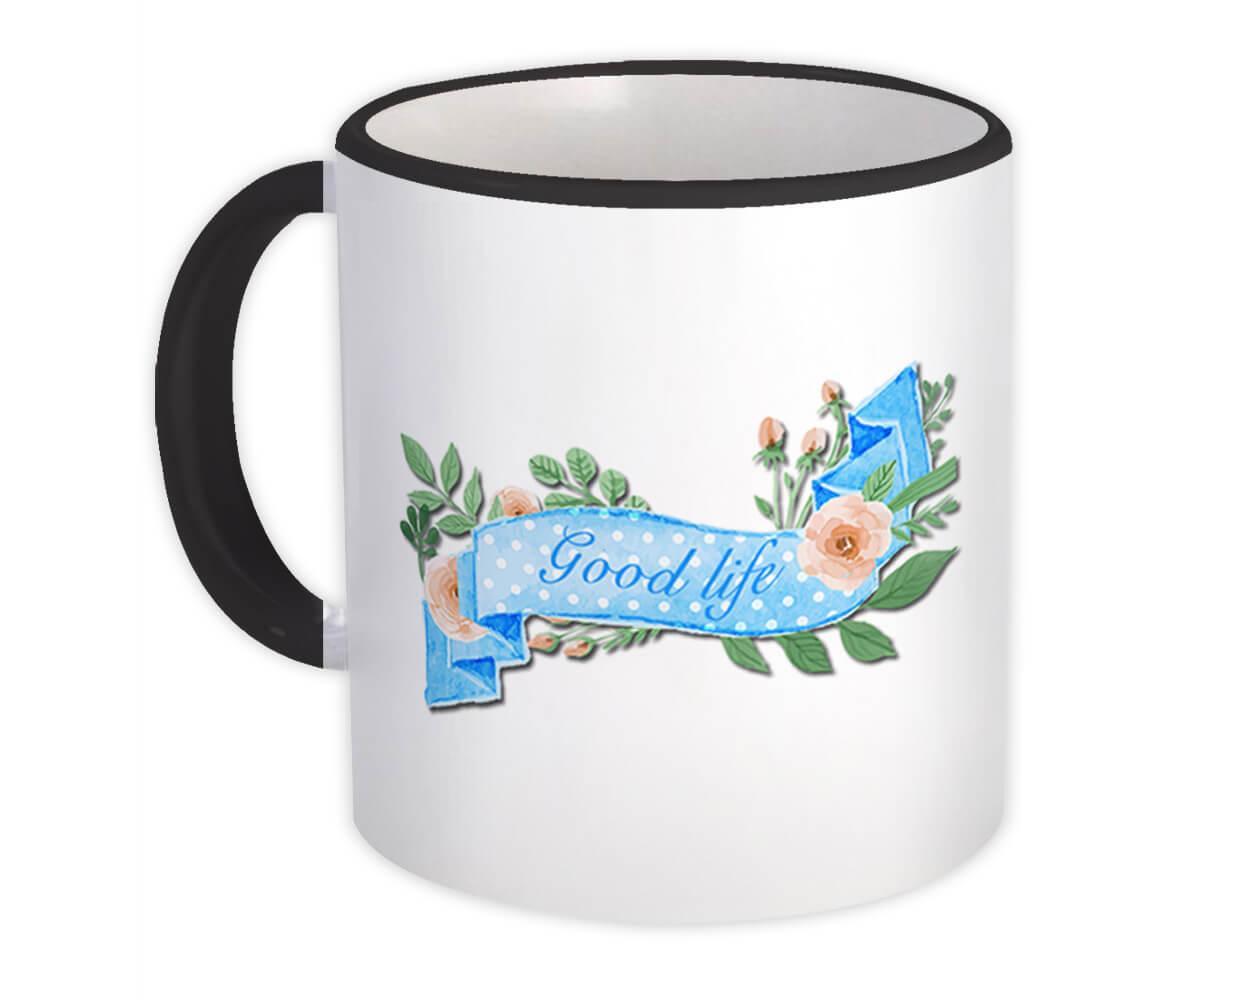 Good Life : Gift Mug Banner Flower Quote Inspirational Decor